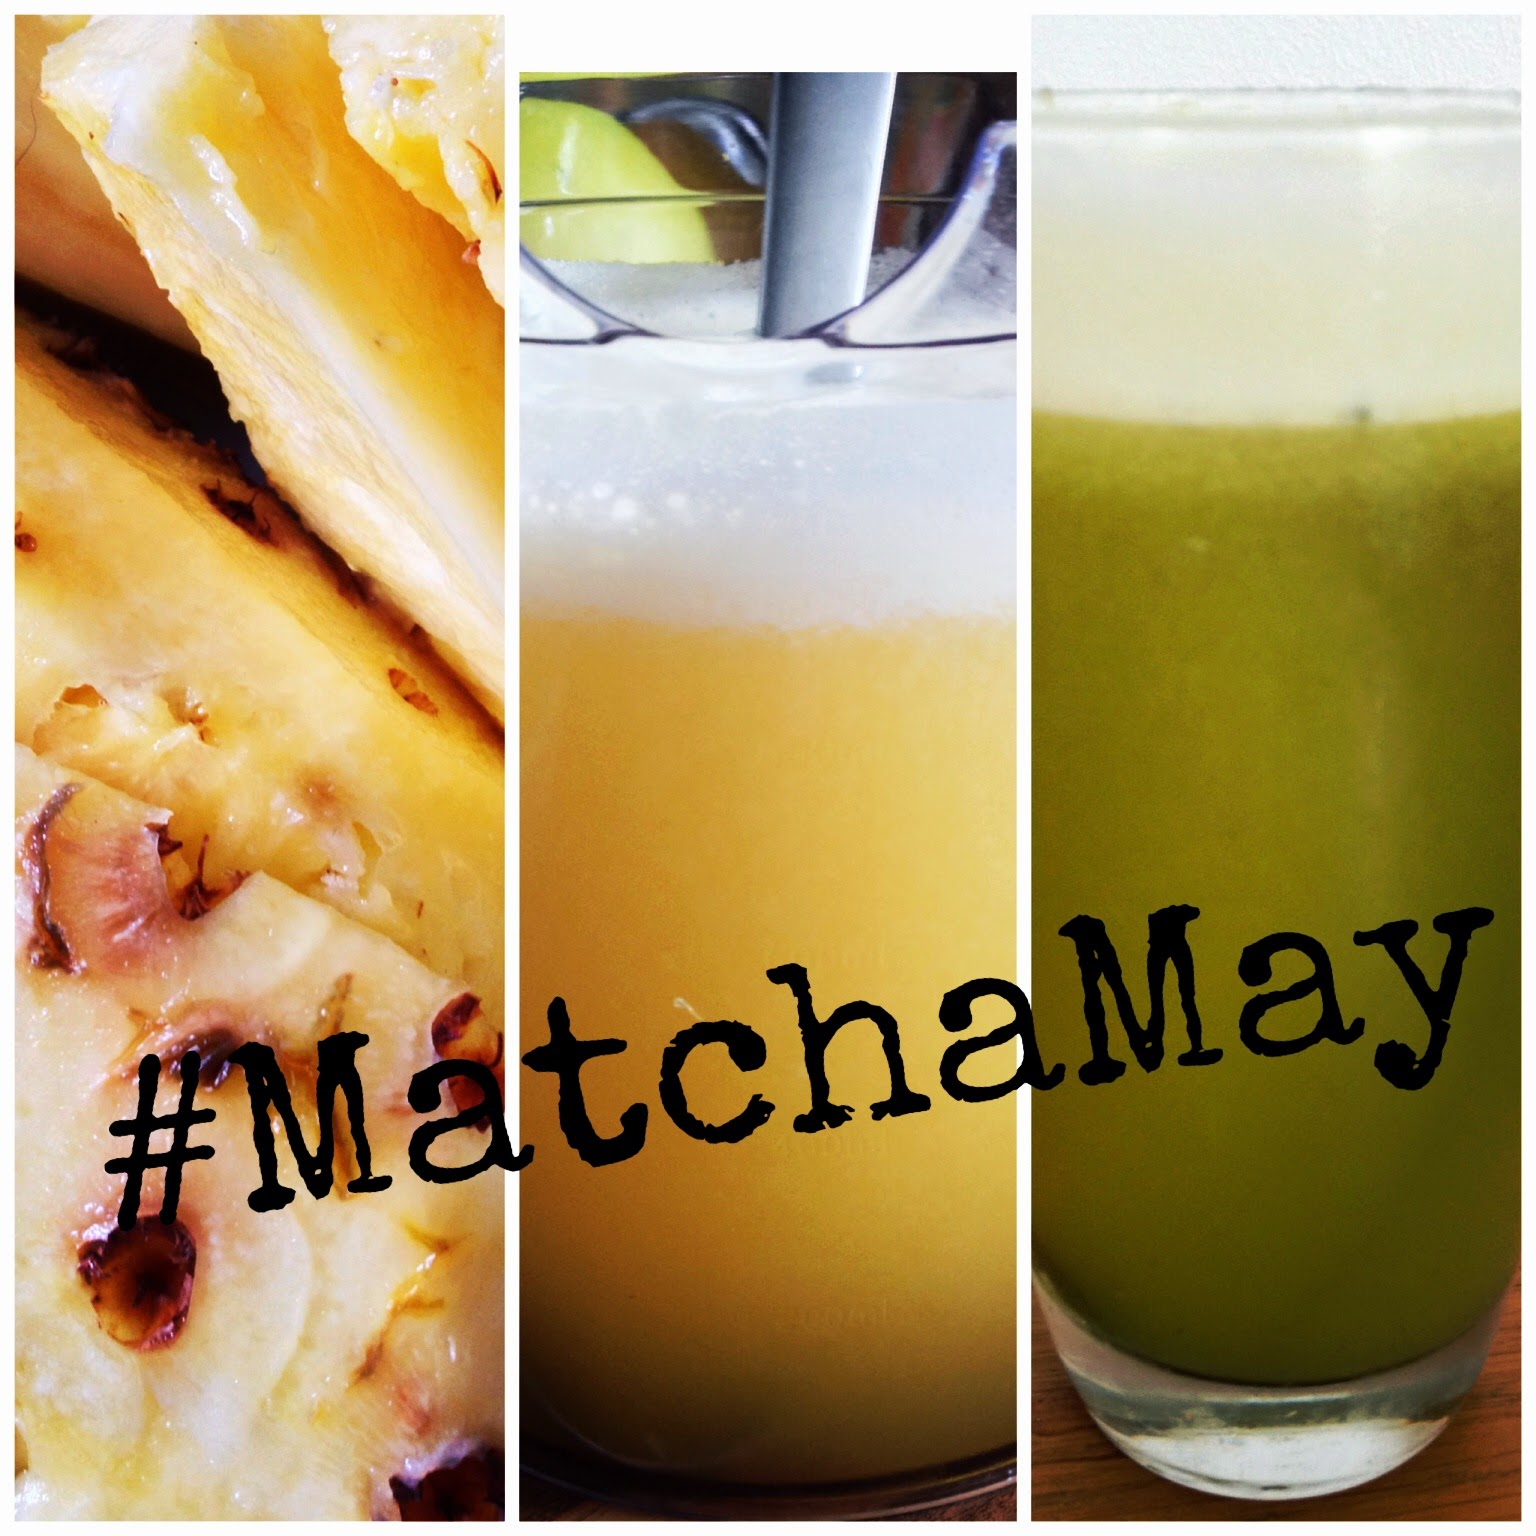 ThatRedheadSaid : #MatchaMay